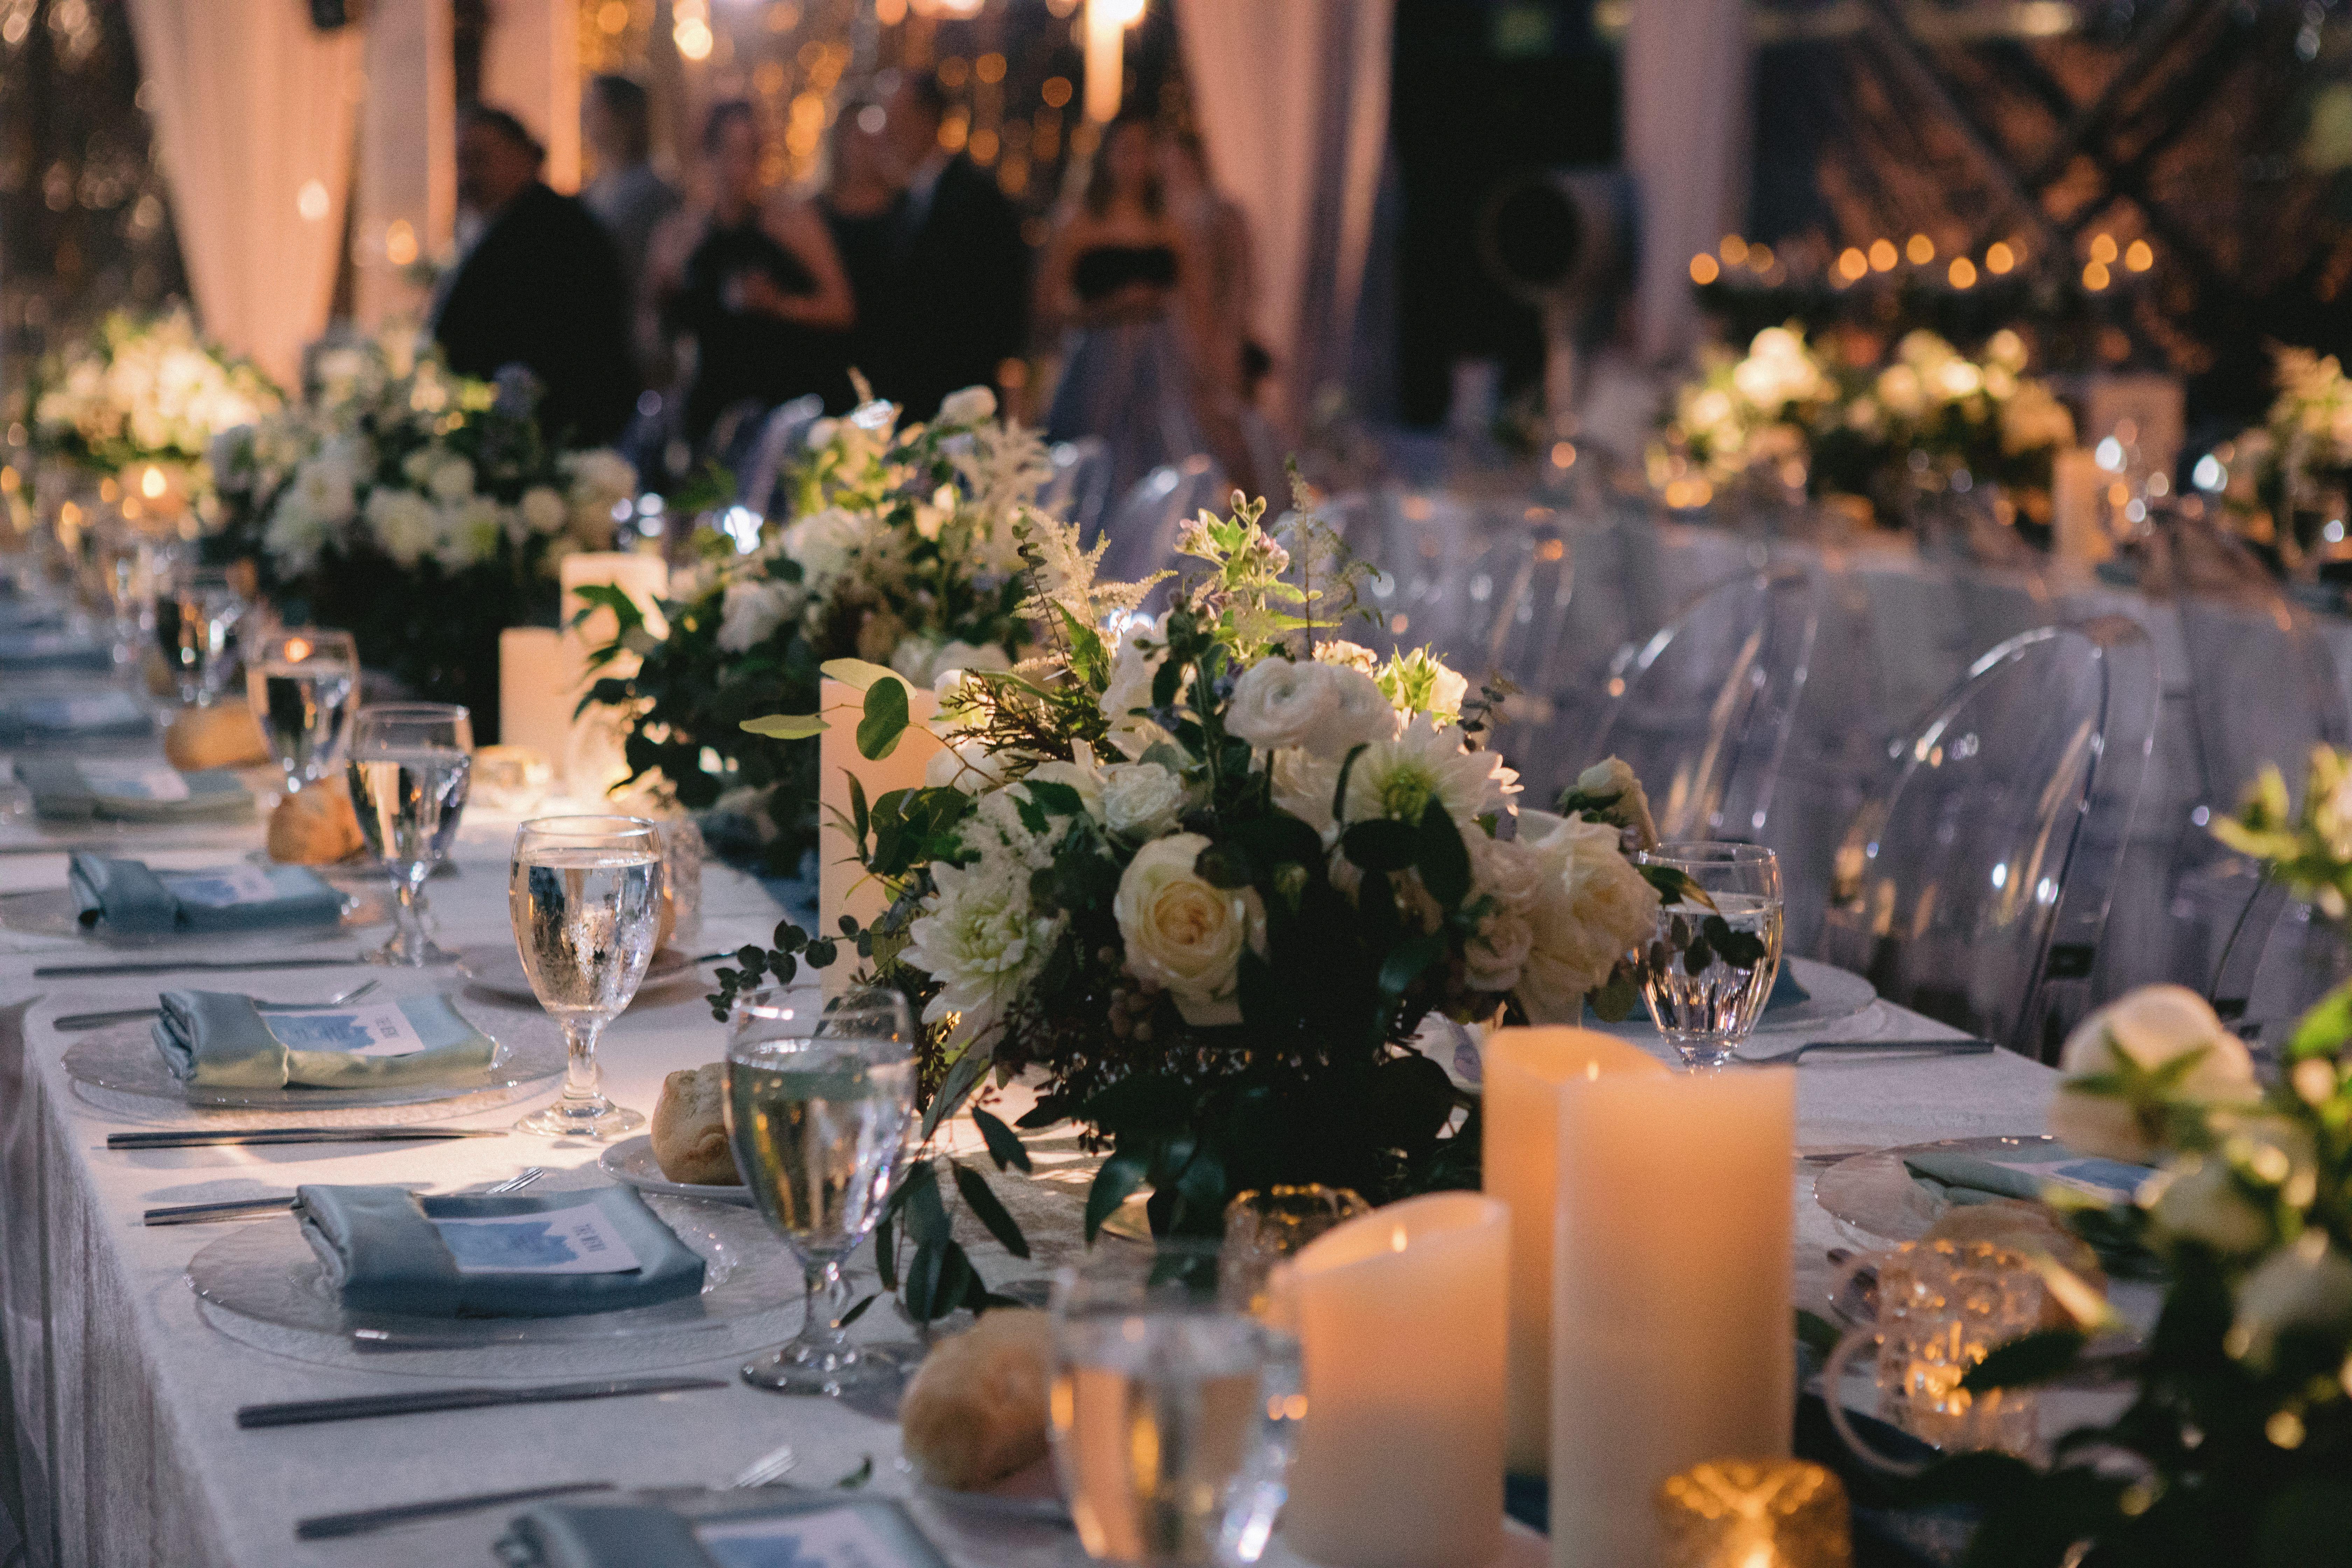 White Wedding Floral Arrangement In 2020 Floral Arrangements Wedding Floral Decor Wedding Centerpieces